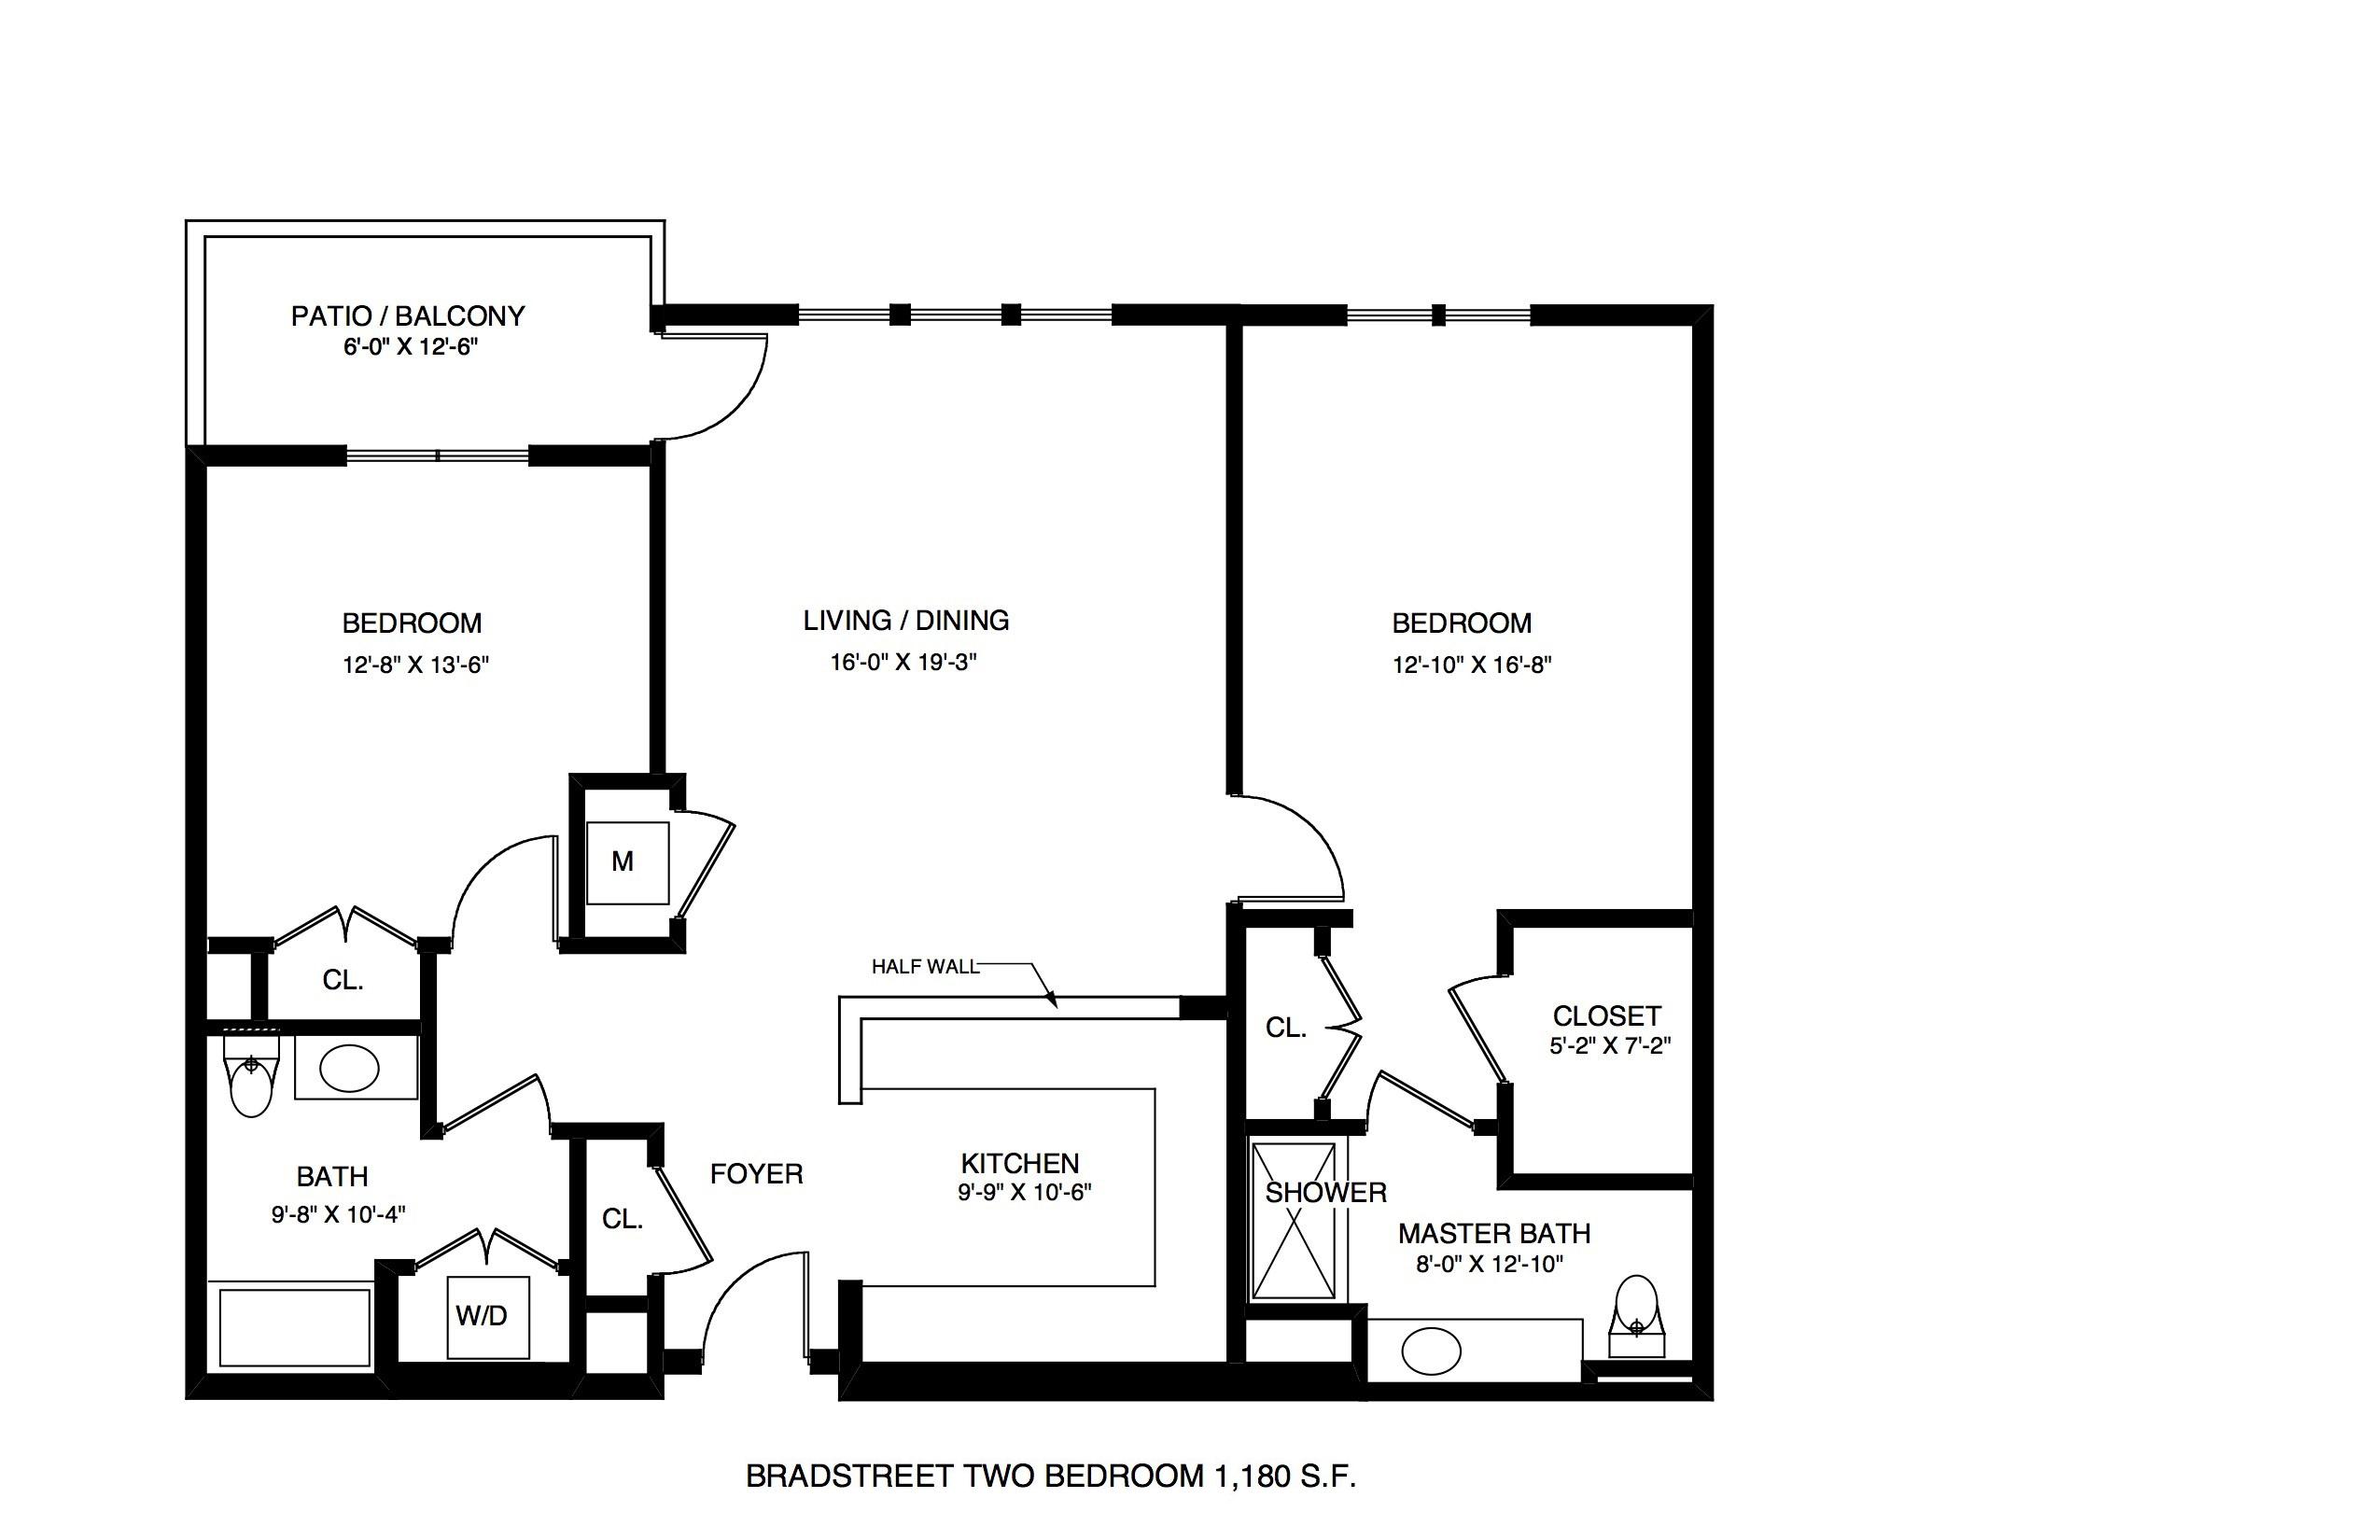 floor plans designing sketching services